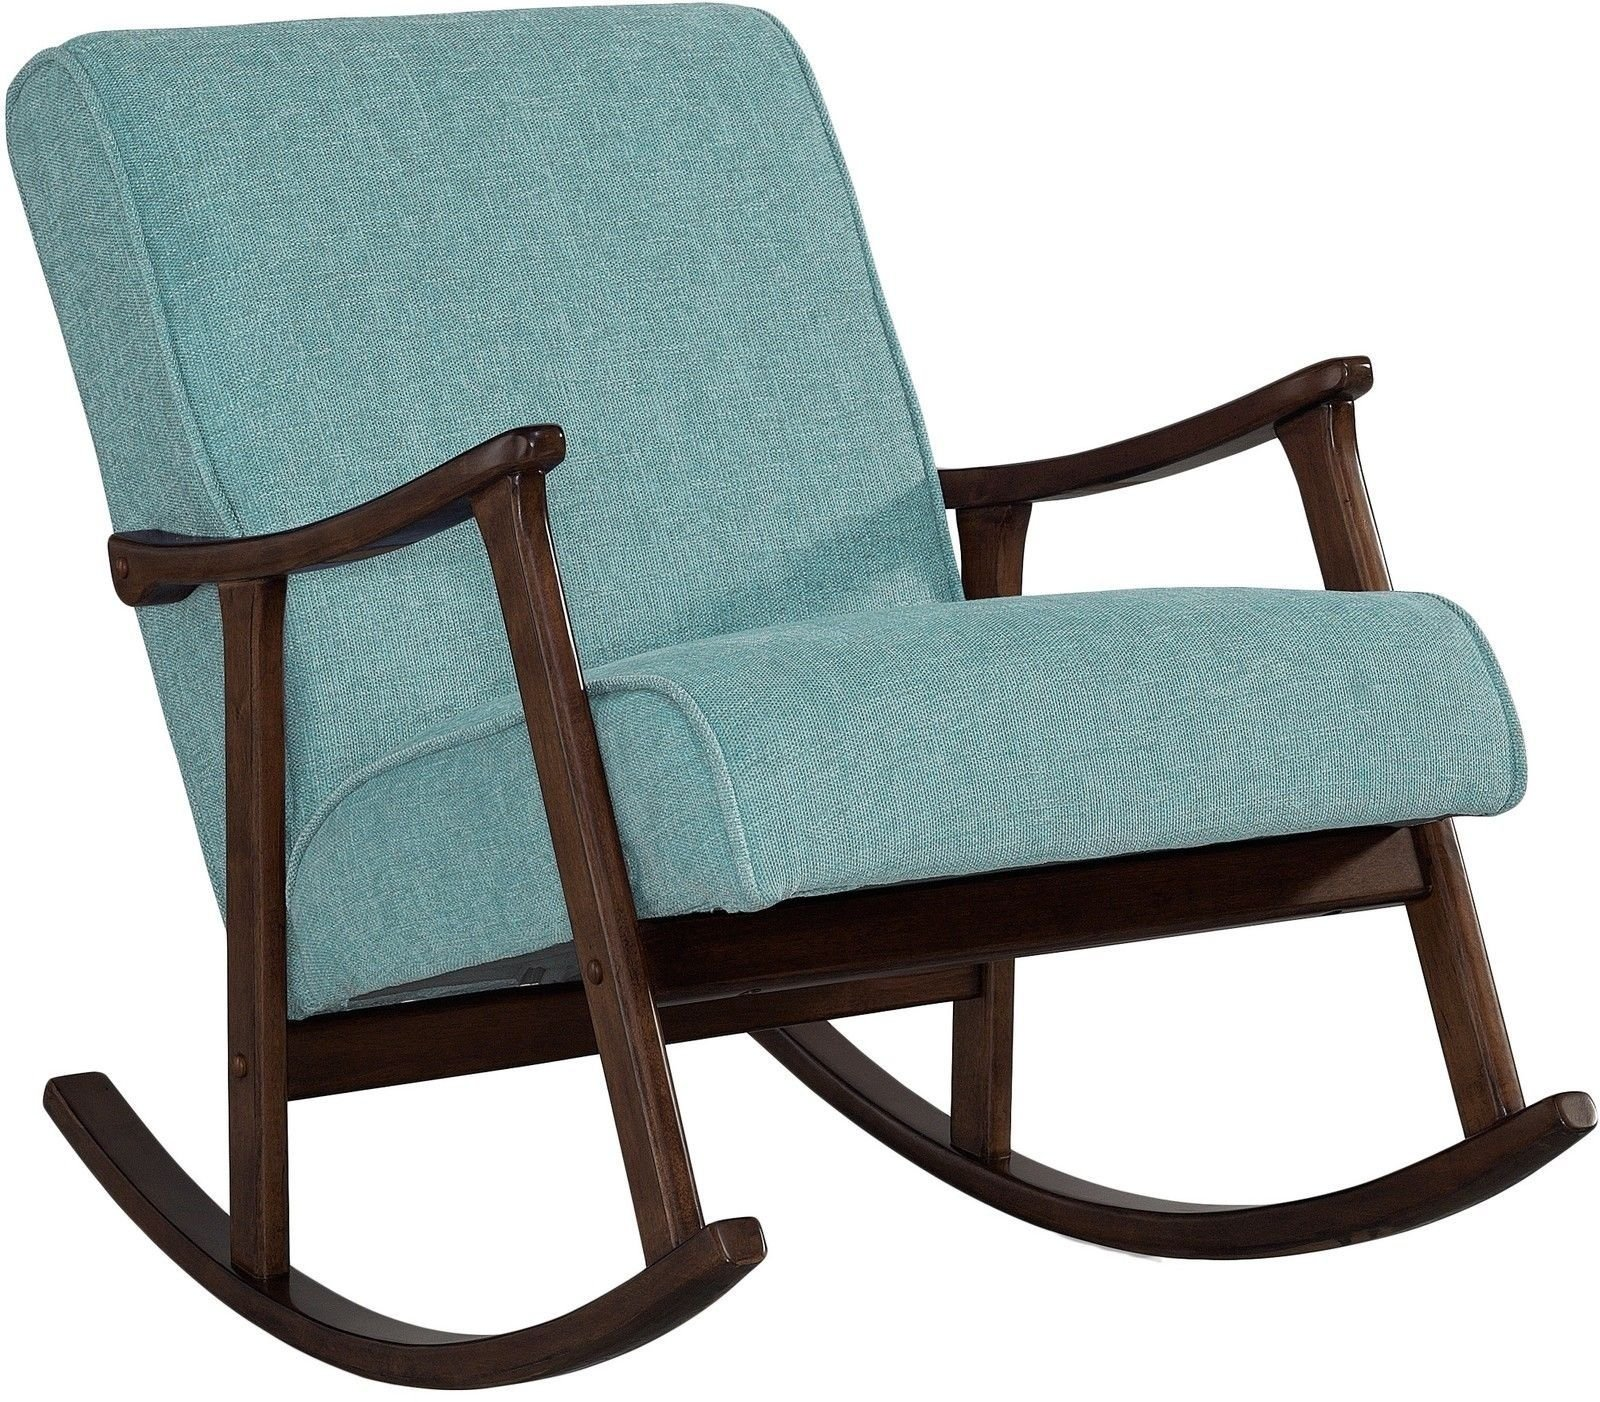 Modern Rocking Chair Nursery Baby Retro Aqua Blue Fabric Wood Rocker Mid Century